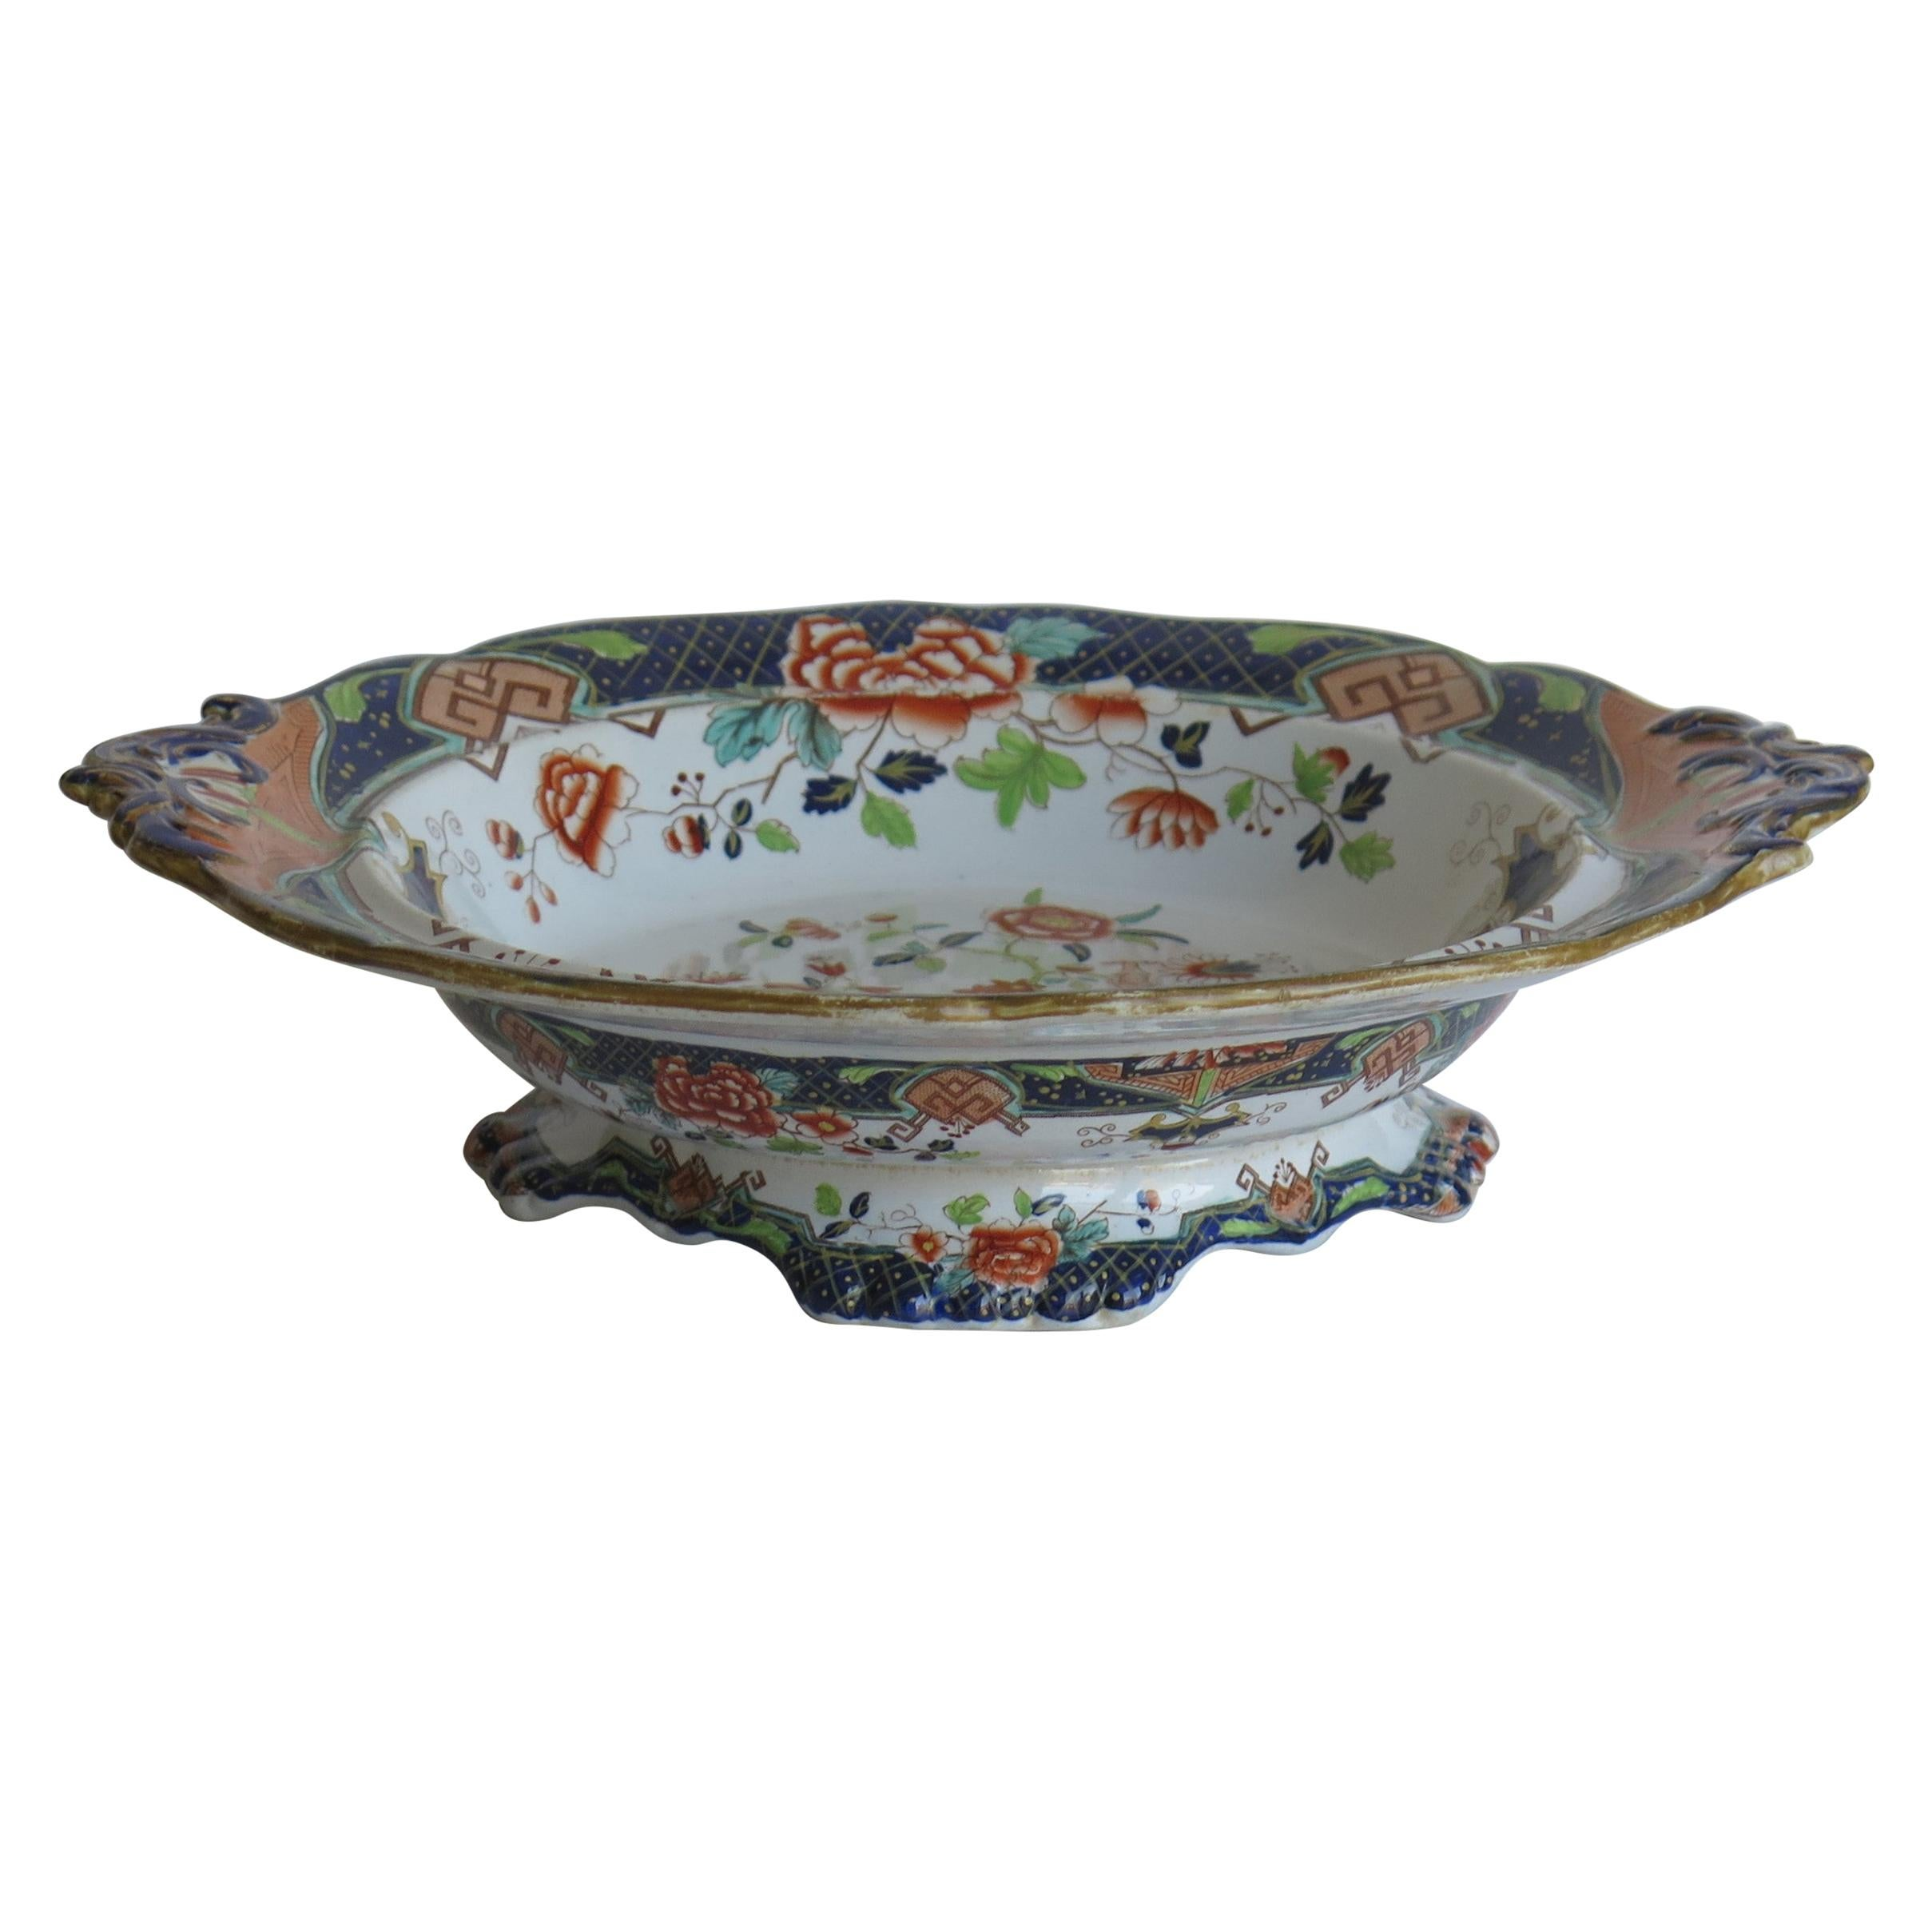 Large Wood & Brownfield Pedestal Bowl Ironstone China Ptn 328, circa 1845